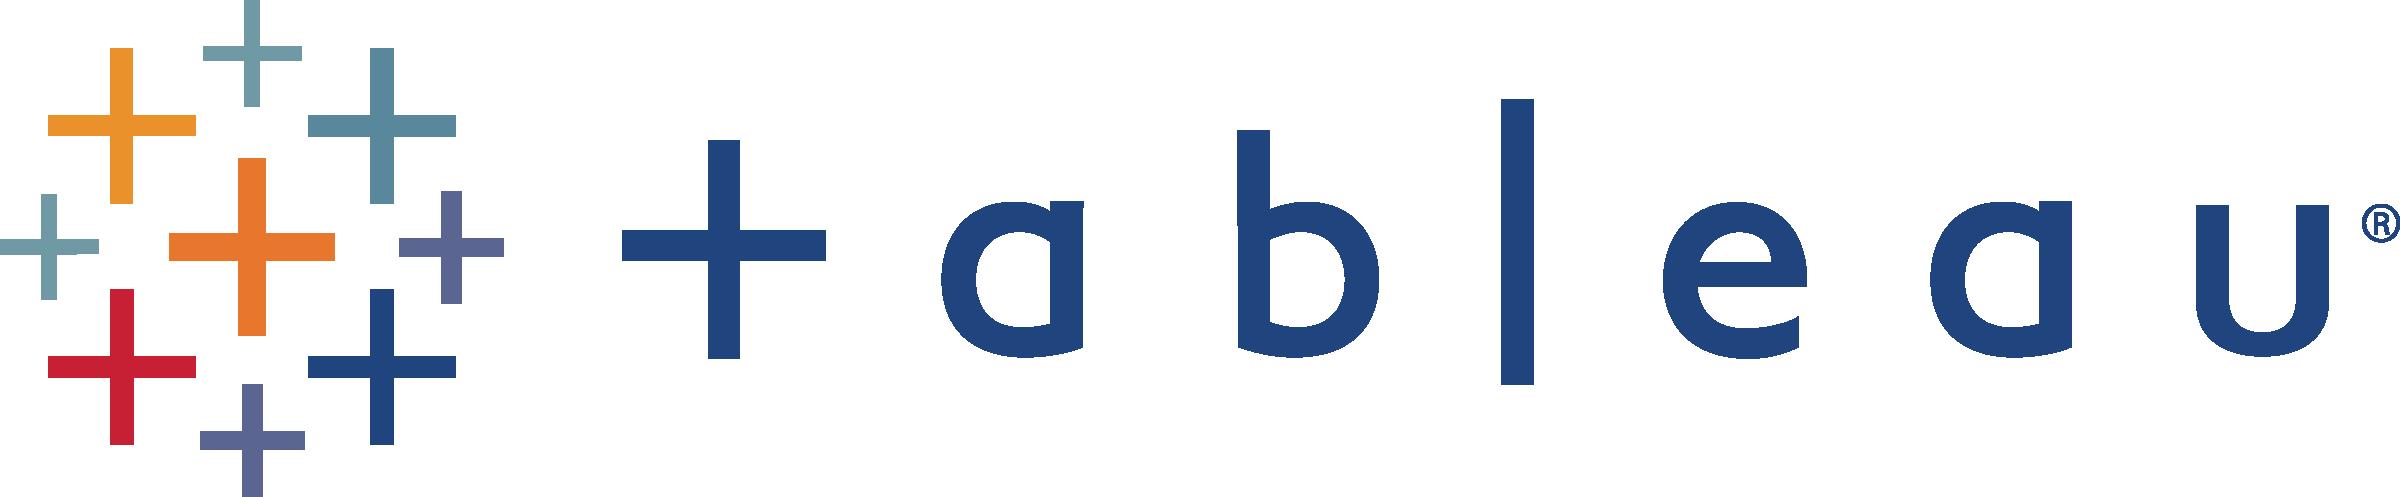 Tableau Data Management logo